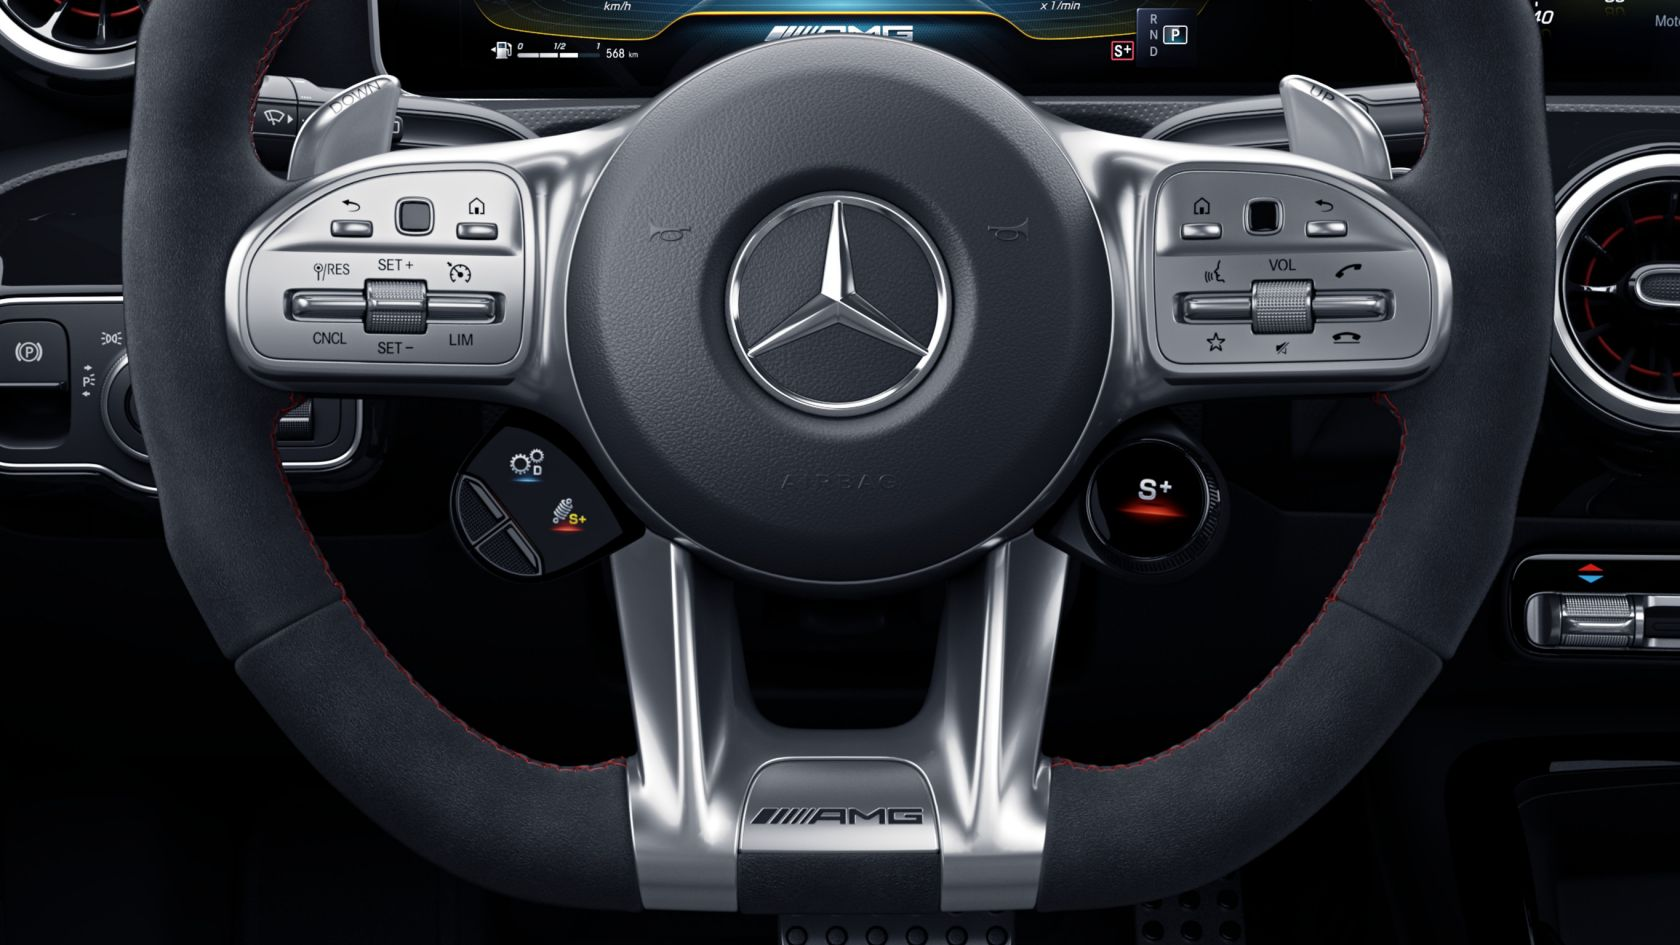 Переключатели AMG на рулевом колесе